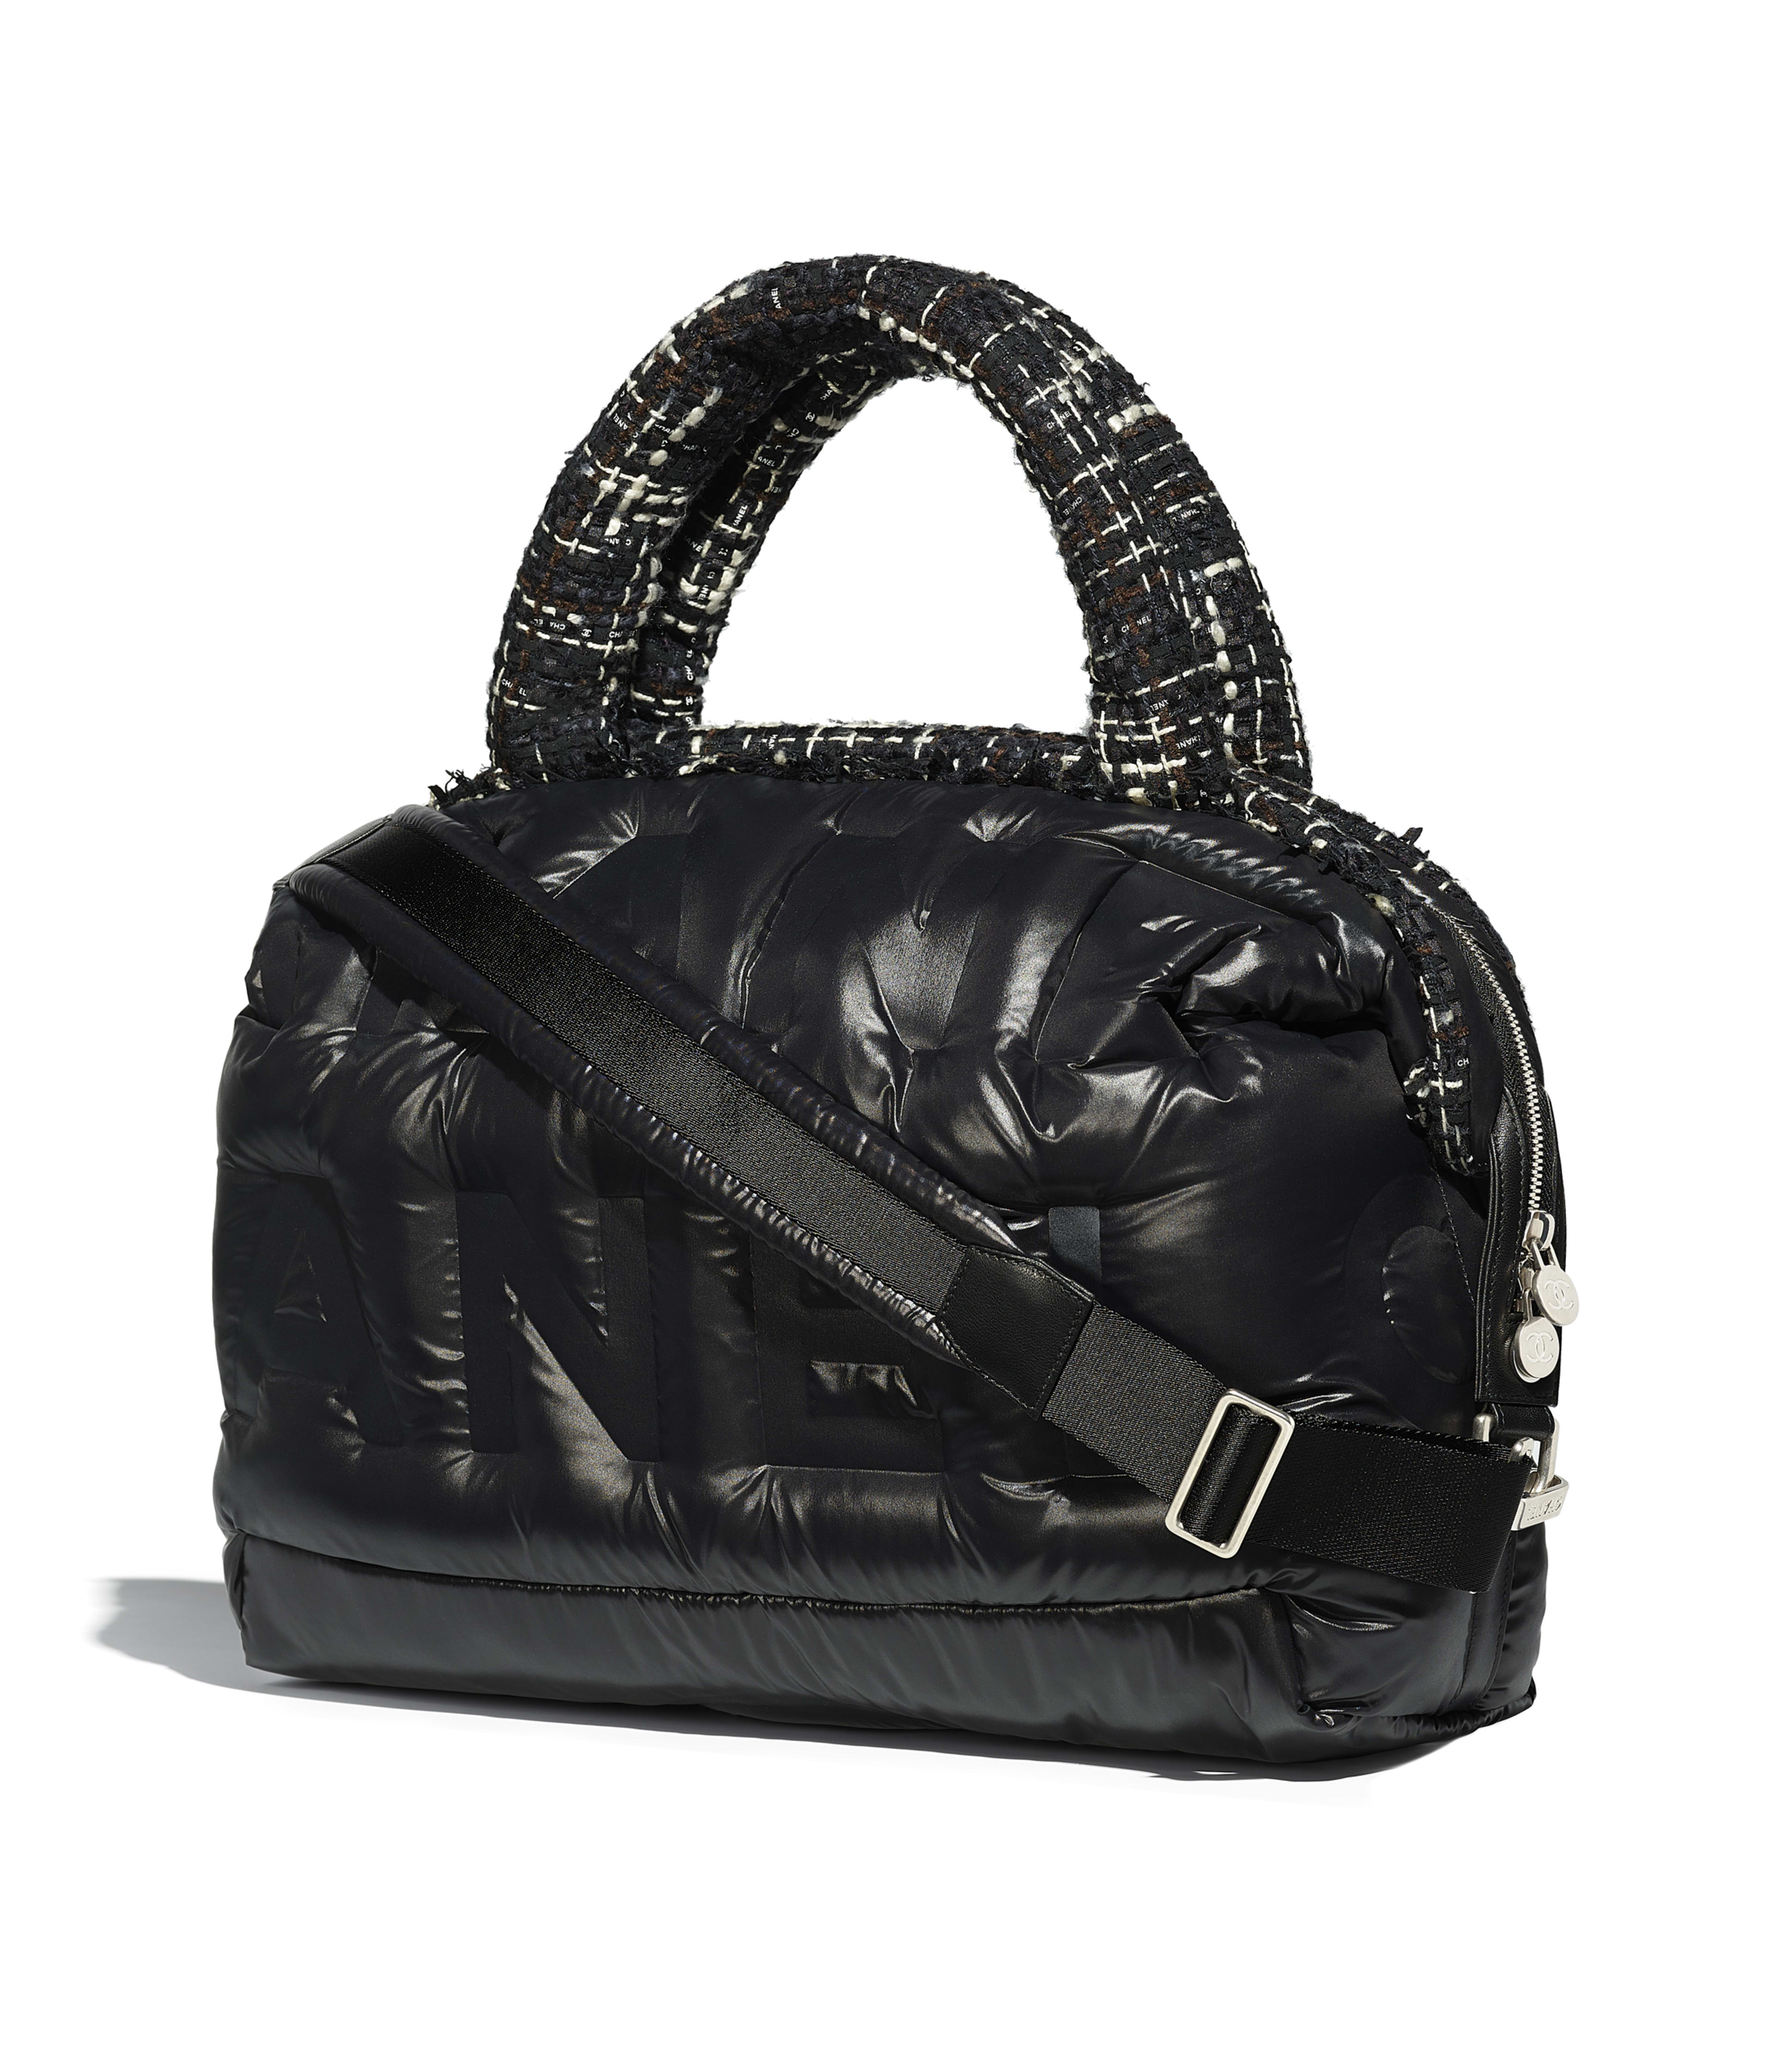 Bowling Bag Nylon Tweed Silver Tone Metal Black Navy Brown Ecru Ref A91937y83830k0991